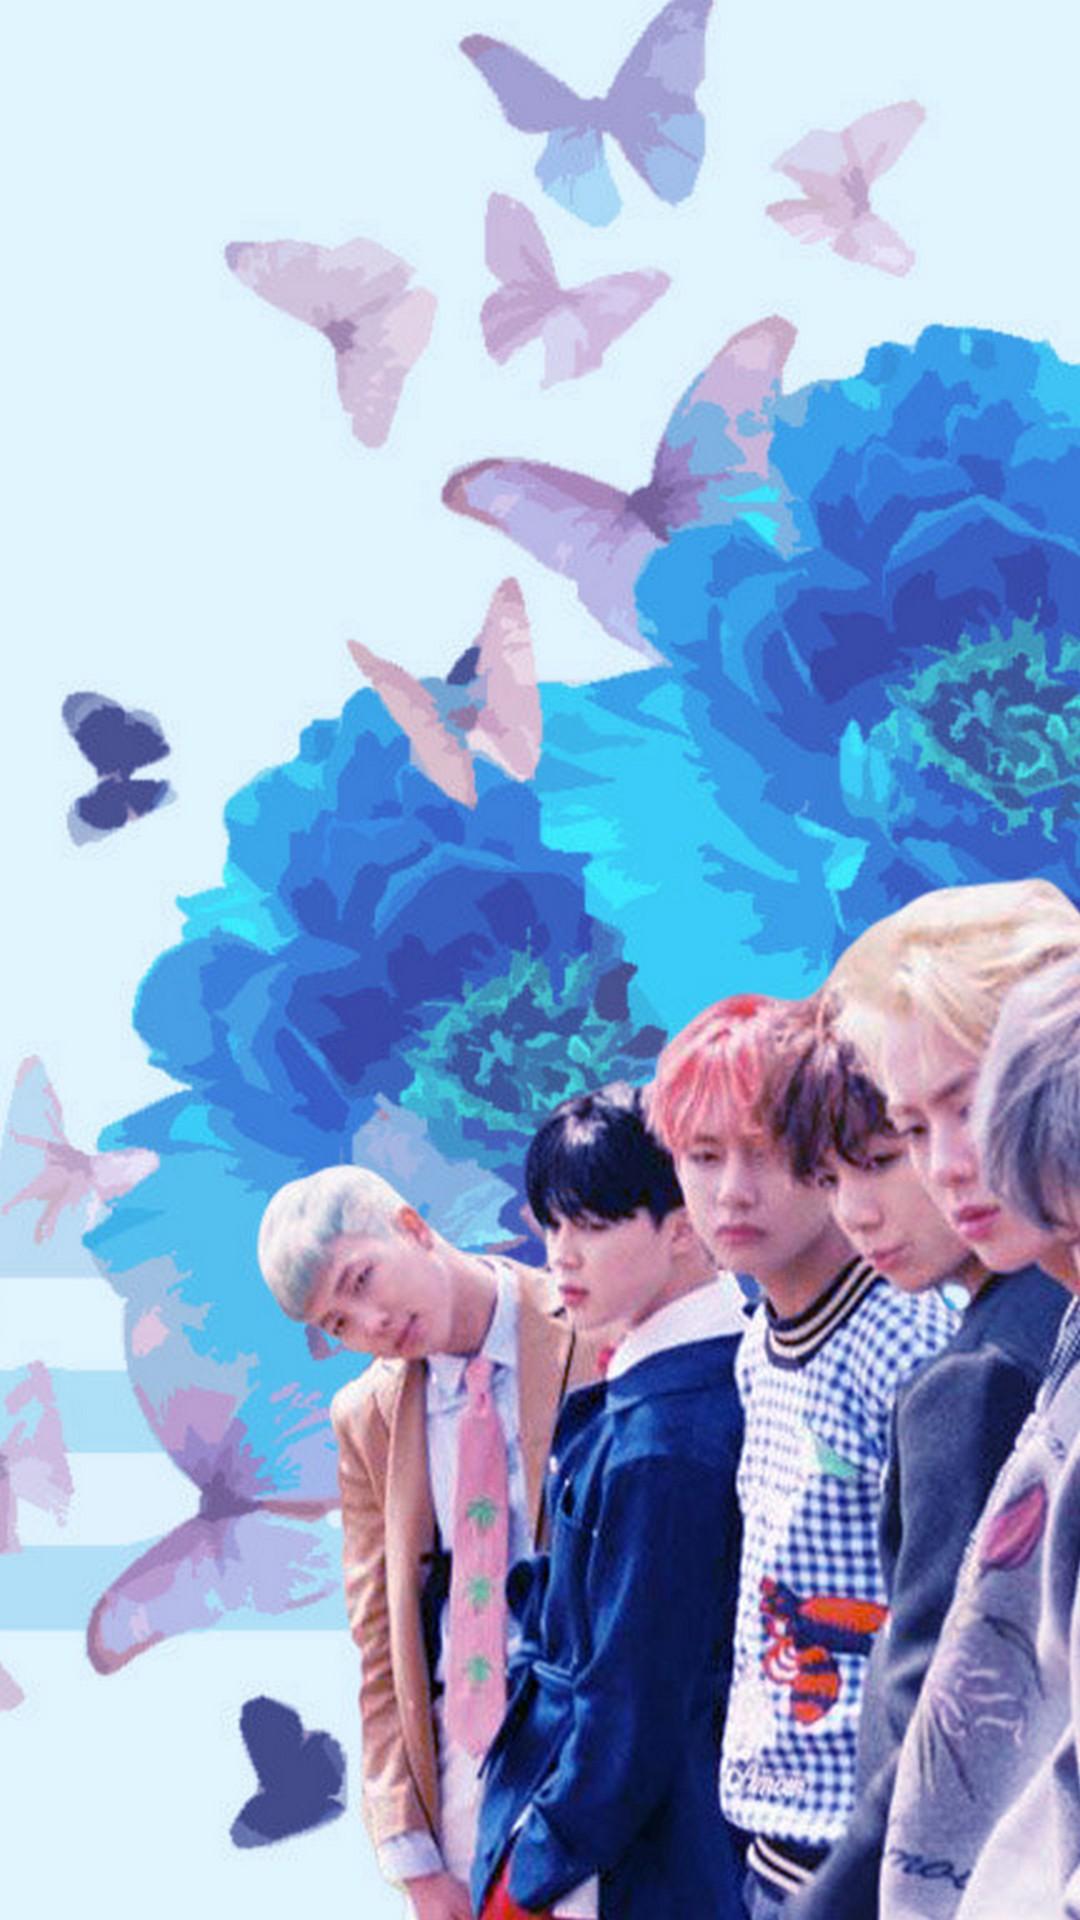 BTS Wallpaper For iPhone 6 Plus